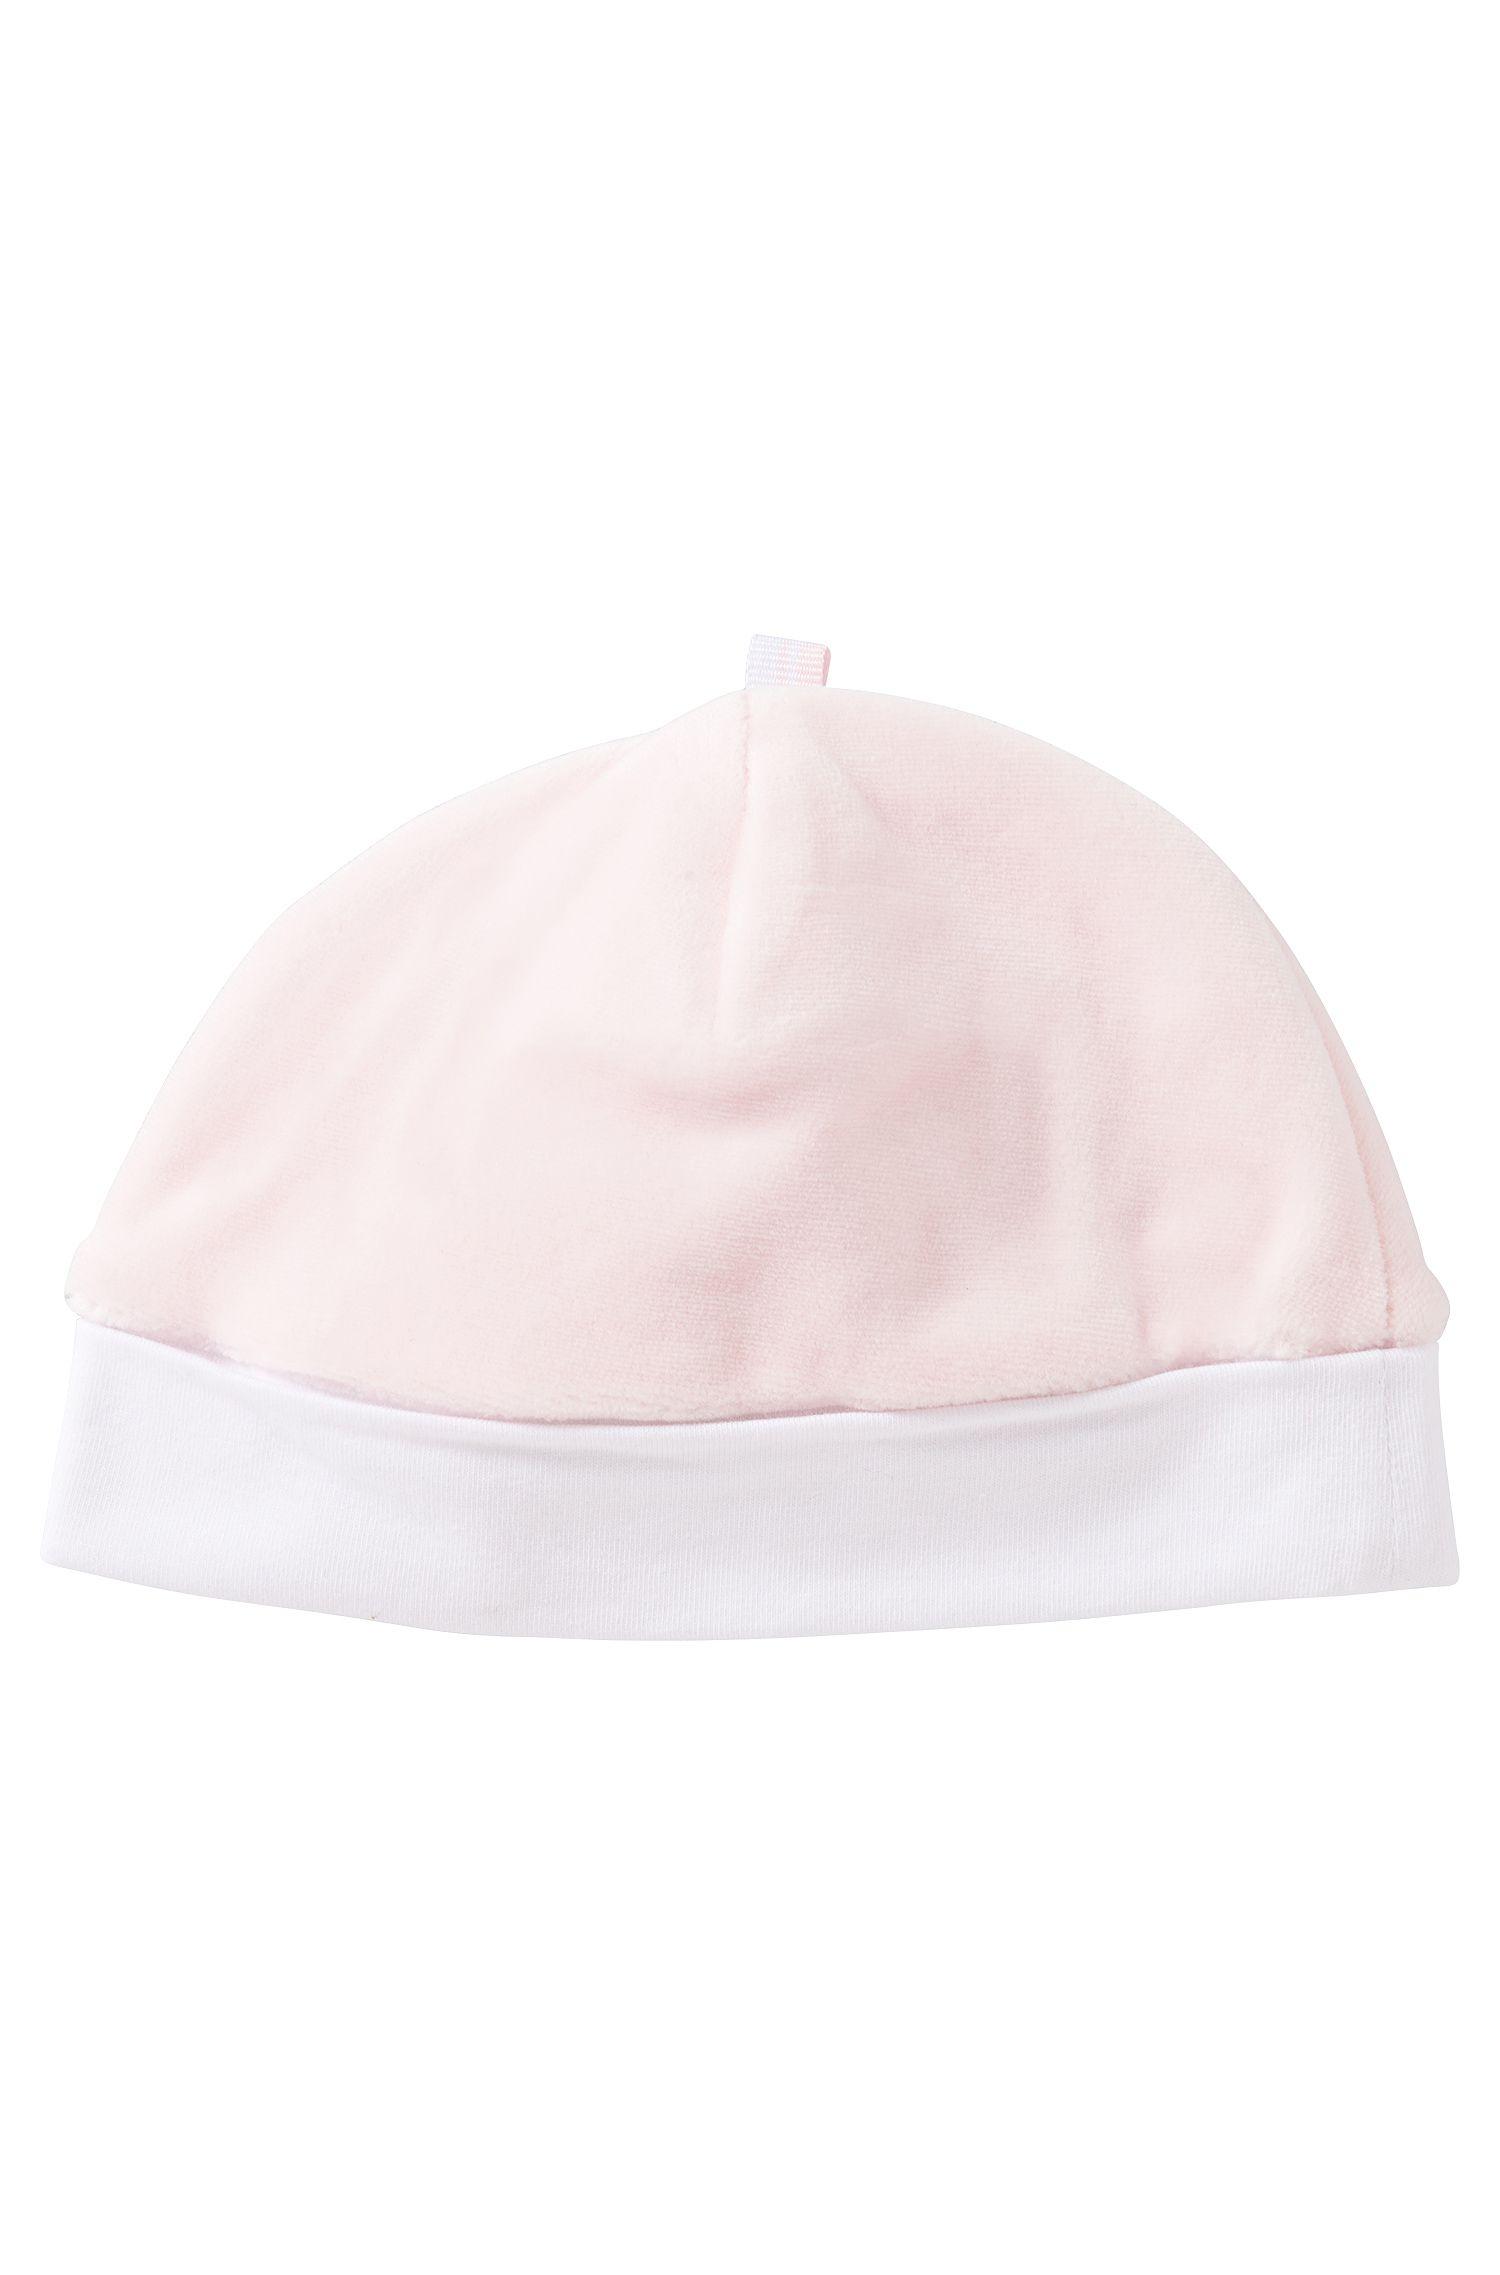 Kids-Mütze aus Baumwoll-Mix: 'J91051'